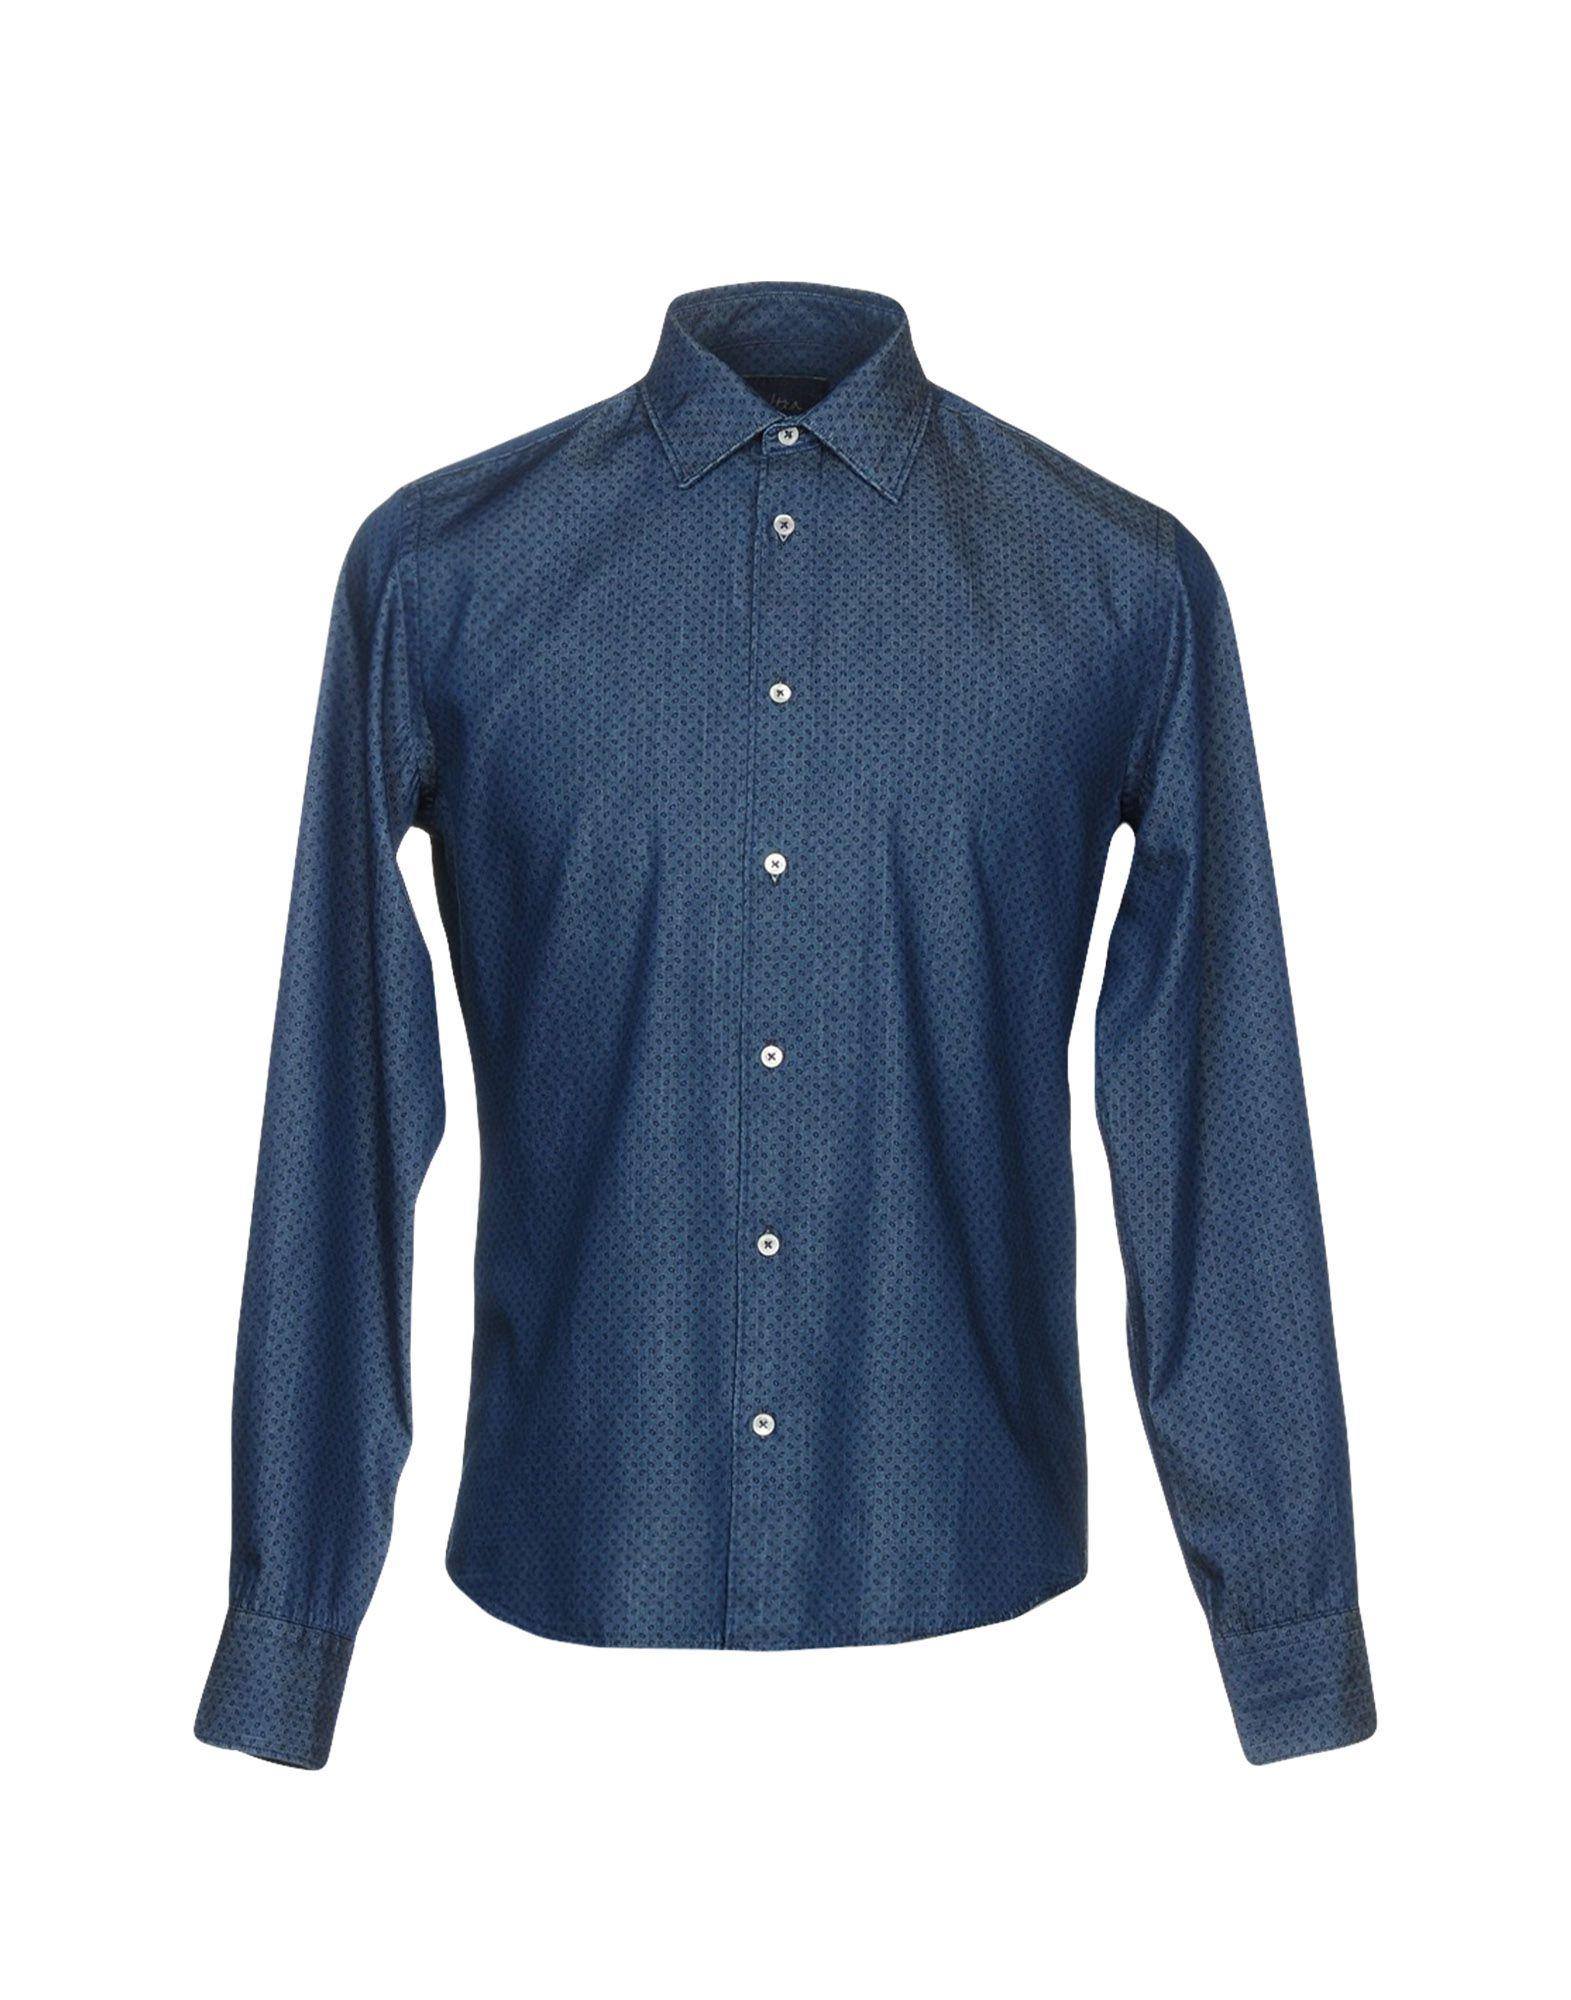 ALTEA dal 1973 Джинсовая рубашка dal dosso® перчатки